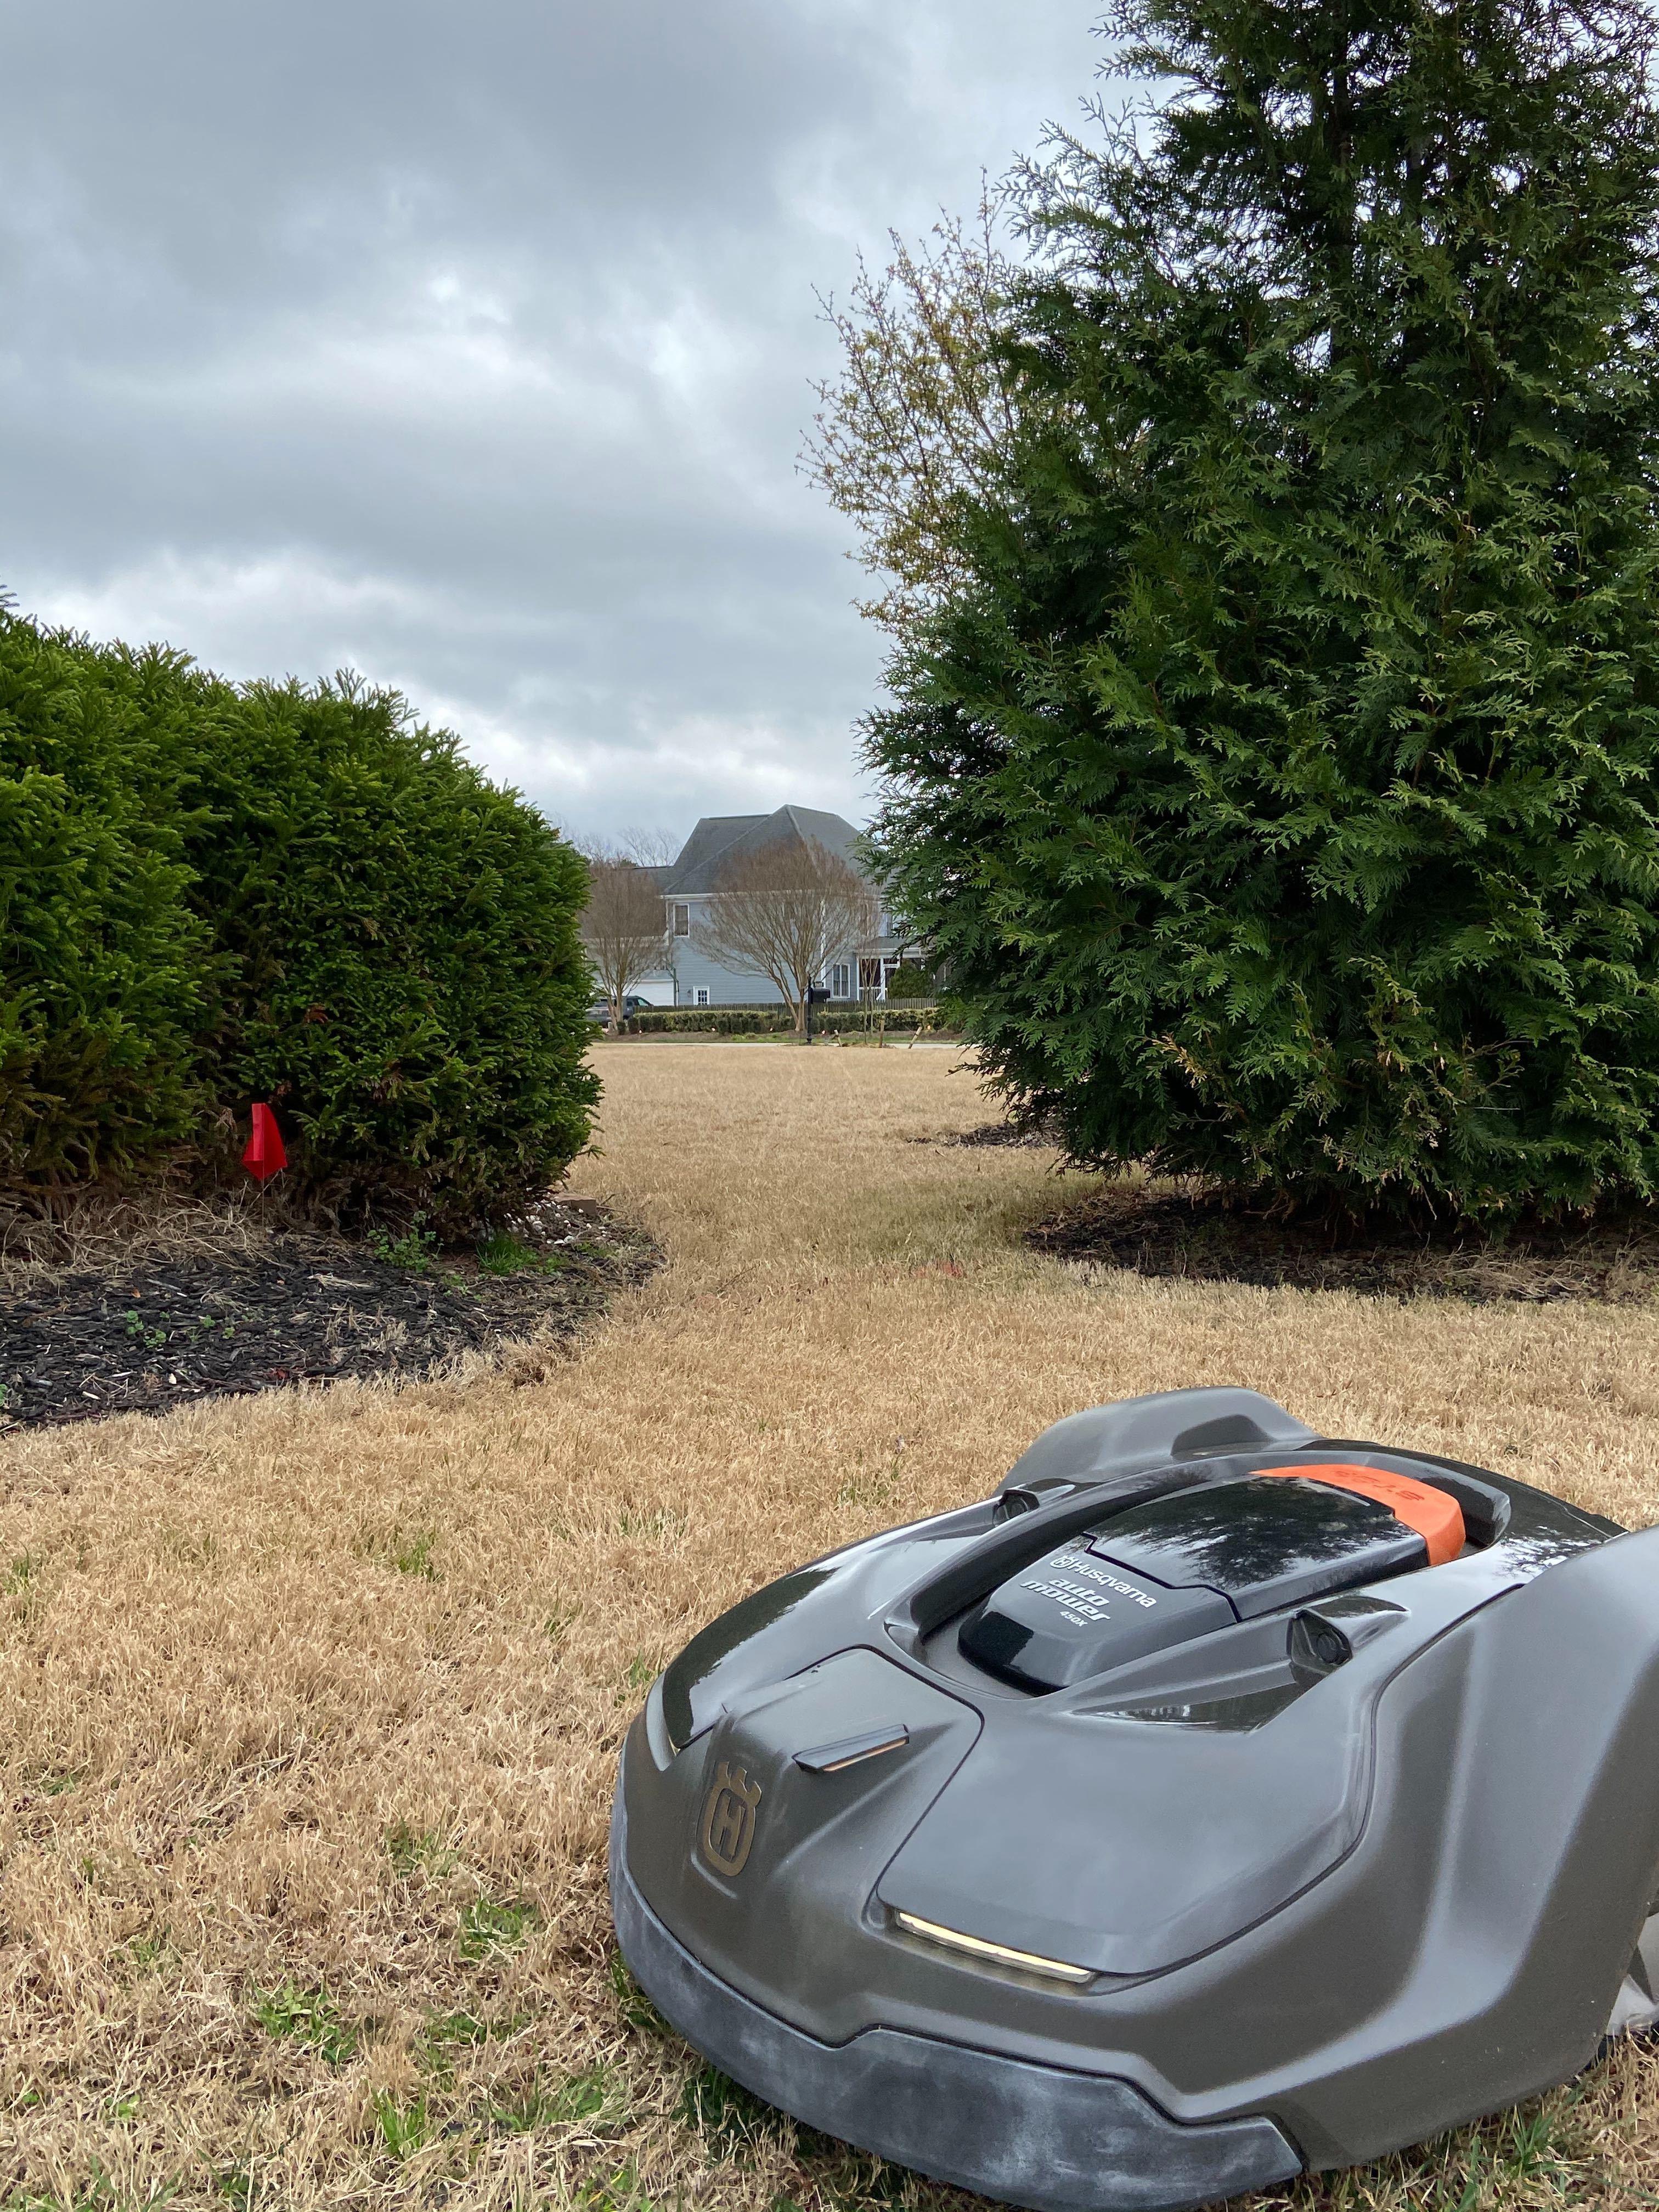 robotic lawn mower on dormant warm season lawn2